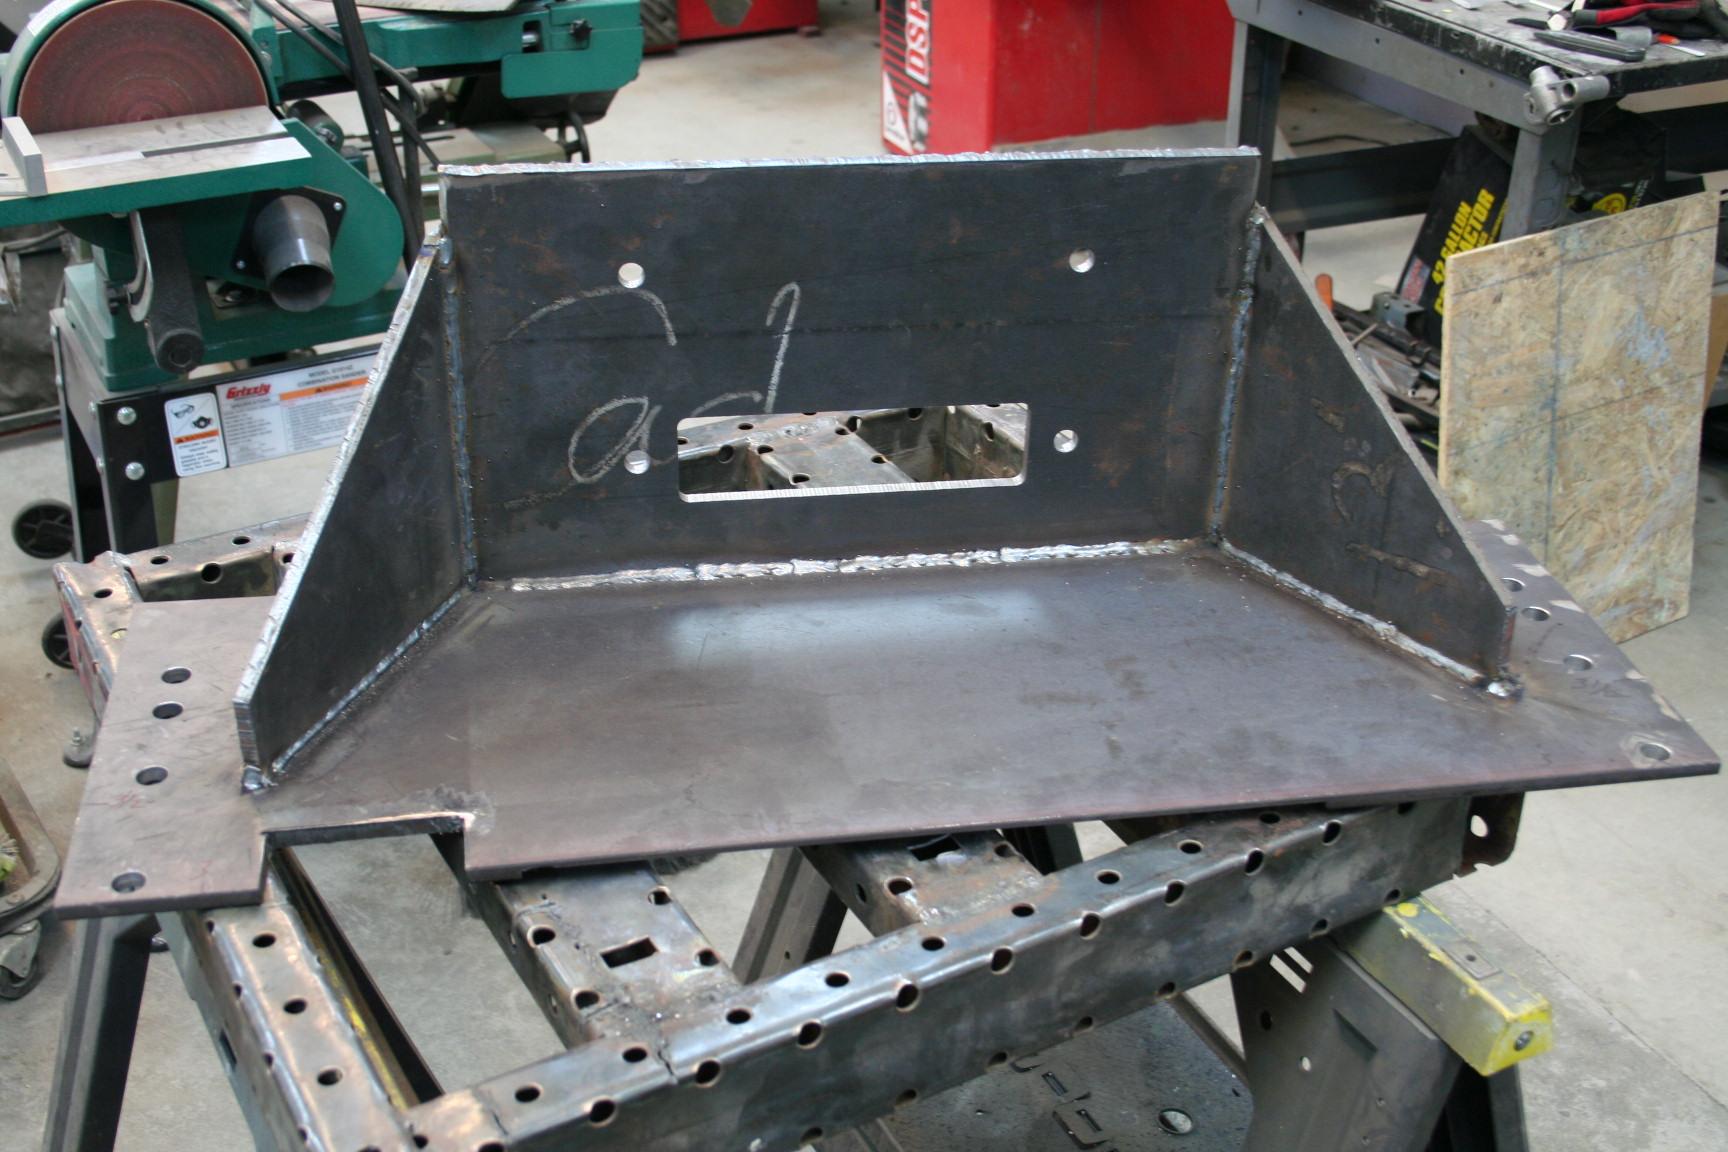 Warn 8274 Winch Mount Tin Shack Restoration